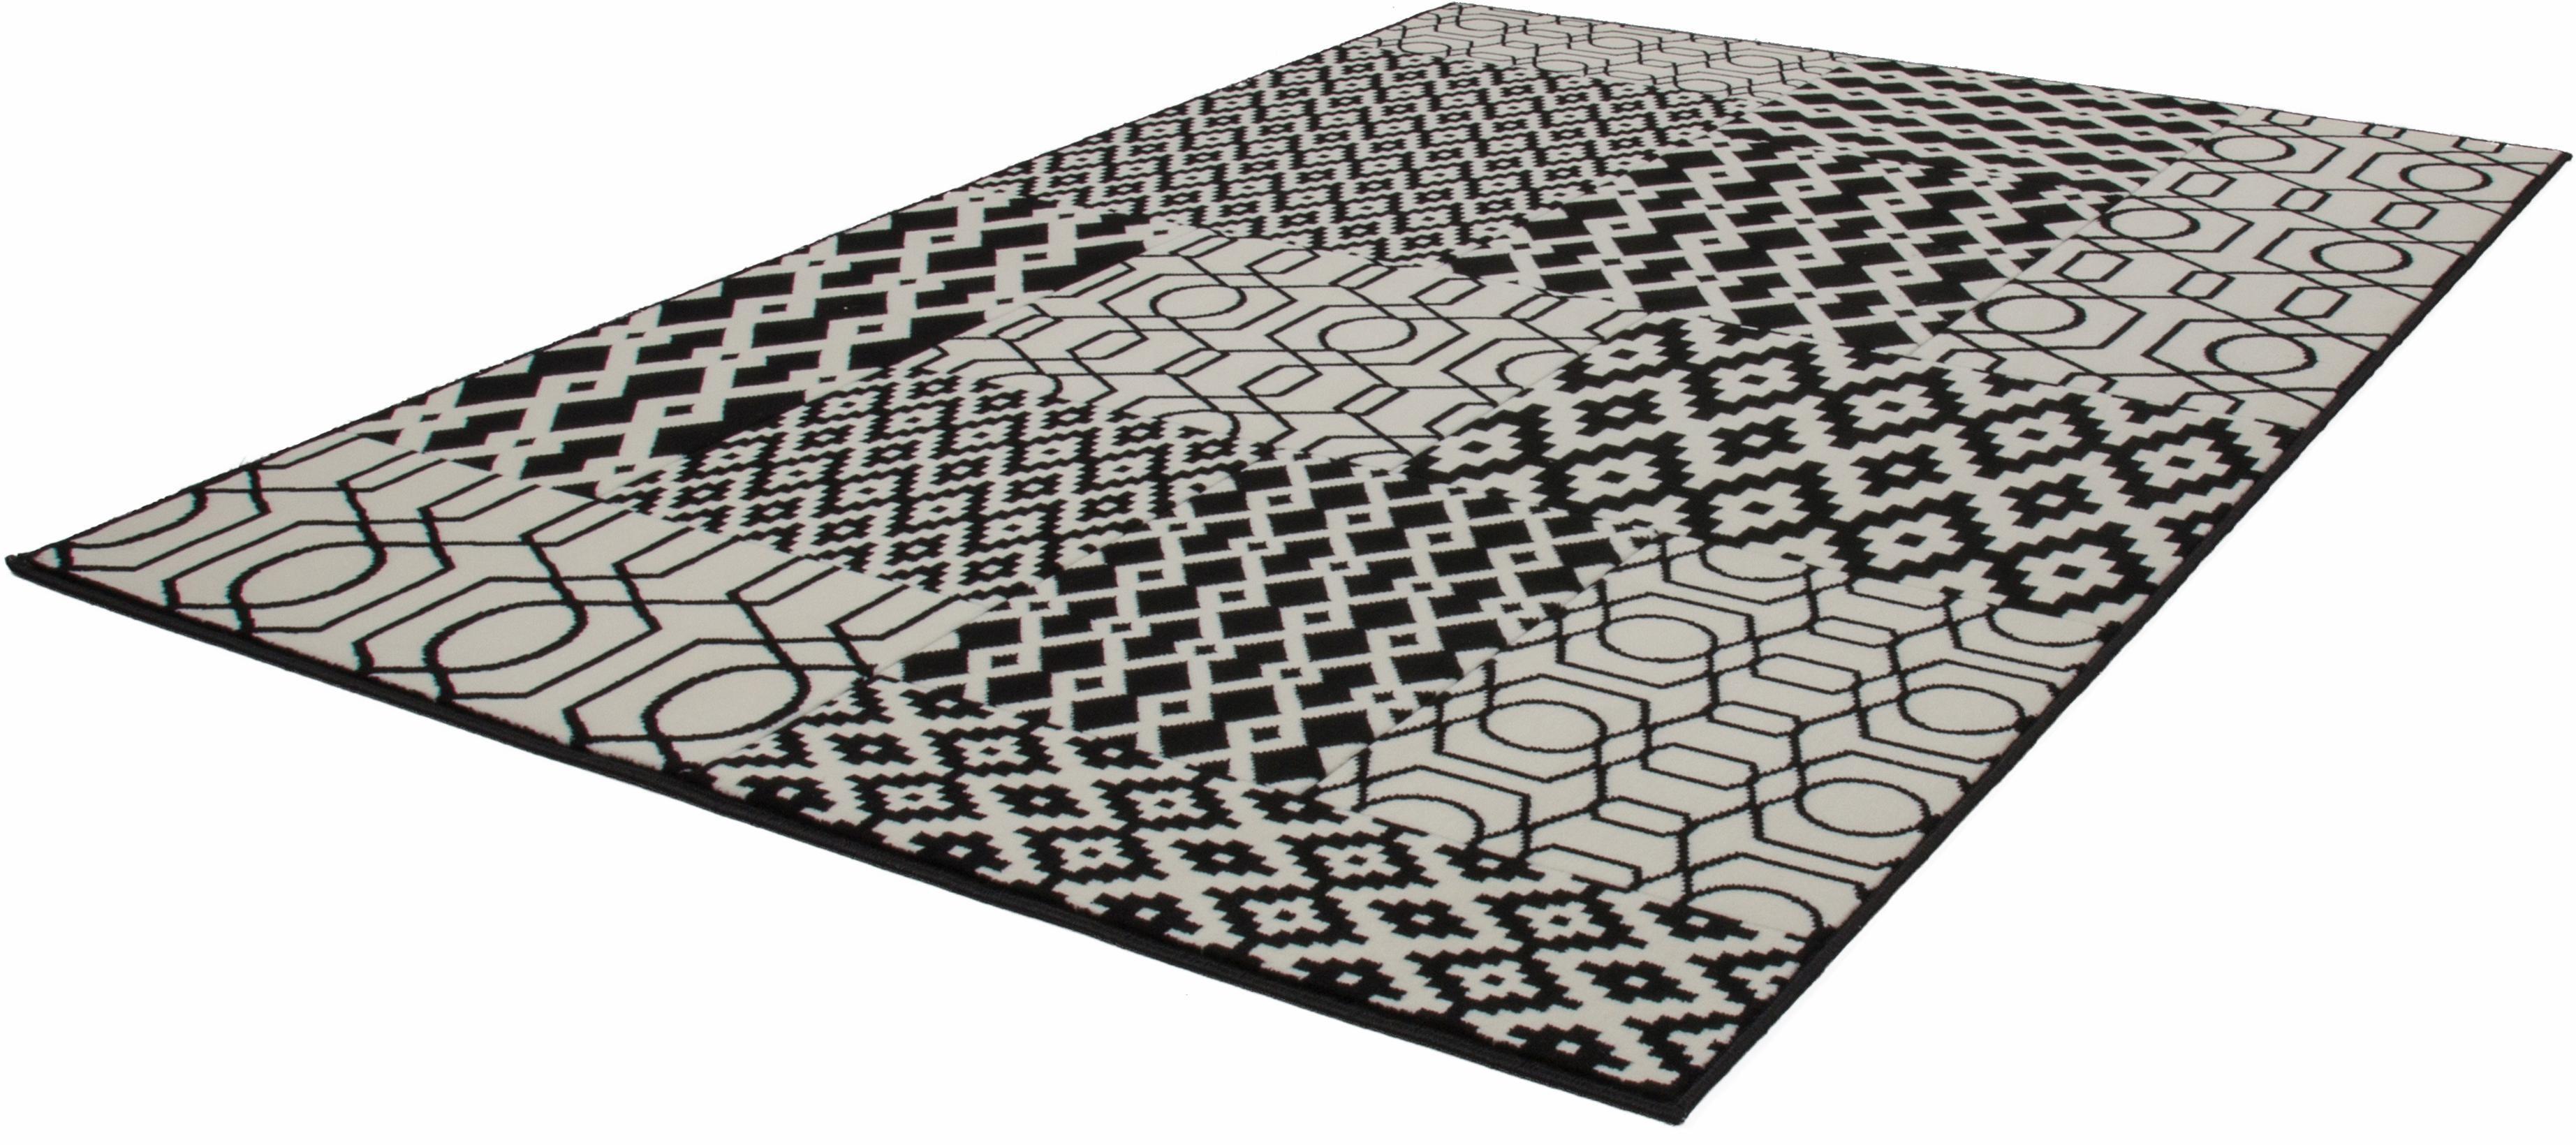 Teppich Lina 300 Kayoom rechteckig Höhe 10 mm